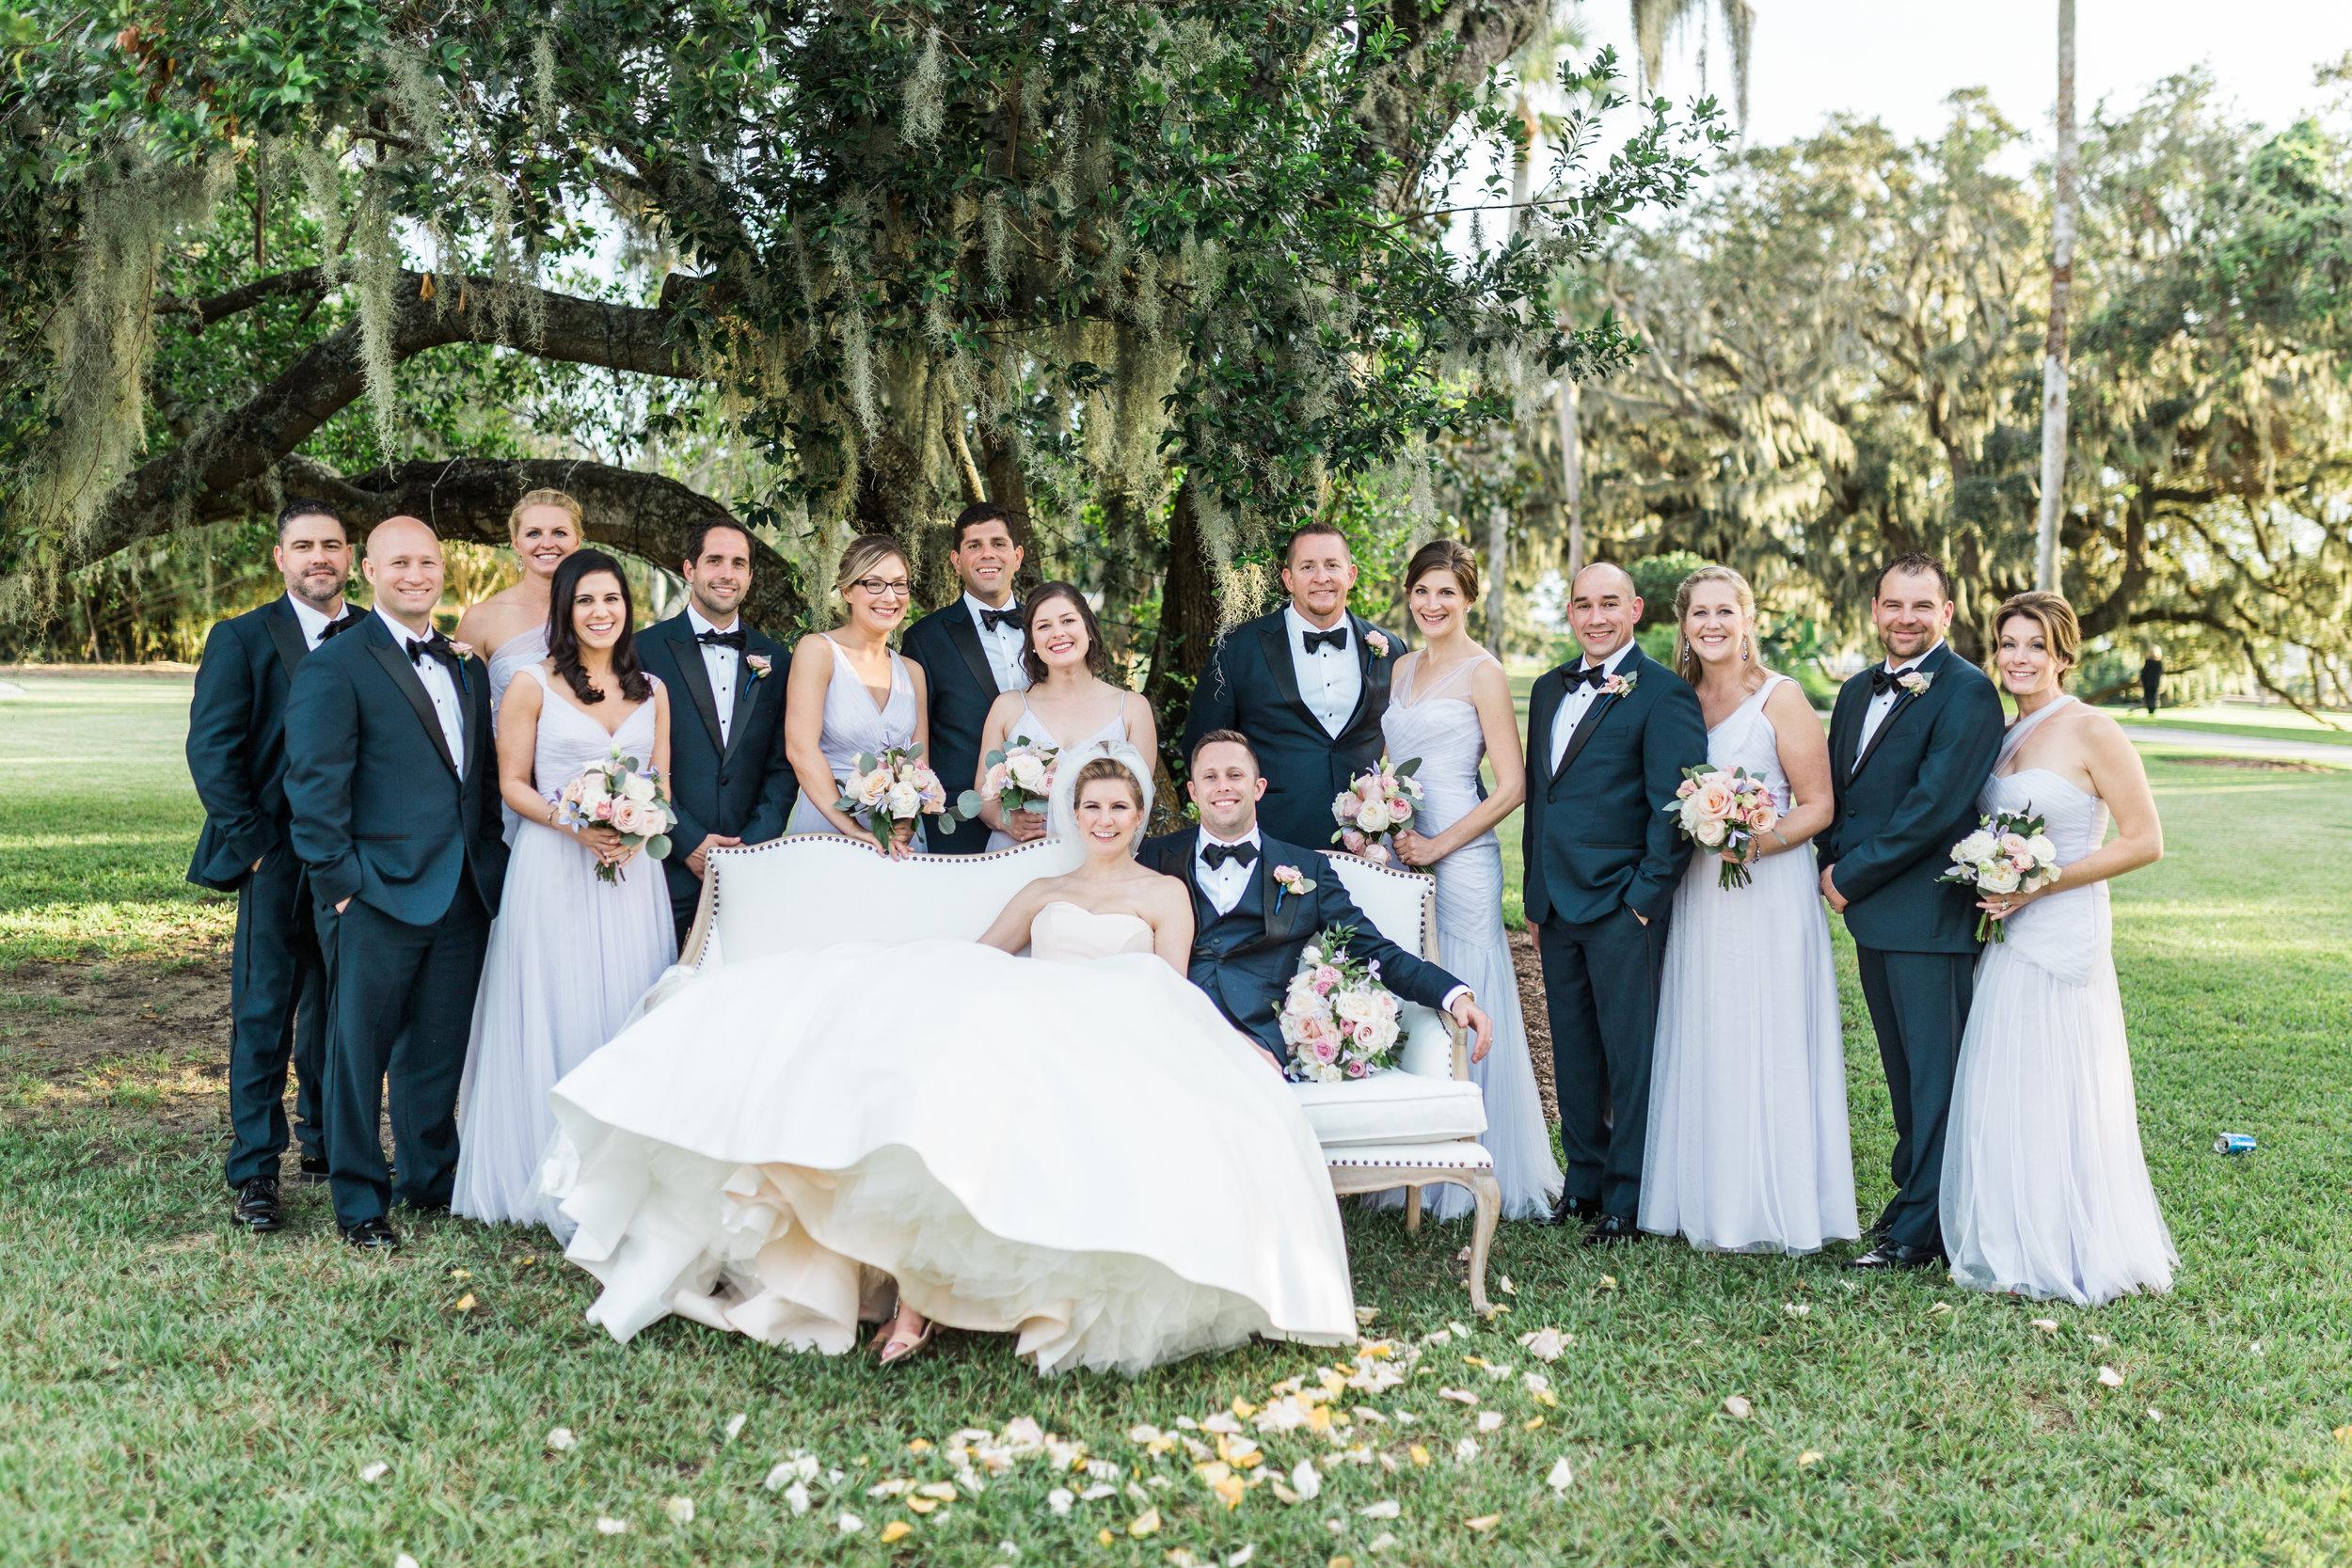 jekyll-island-resort-wedding-13.jpg